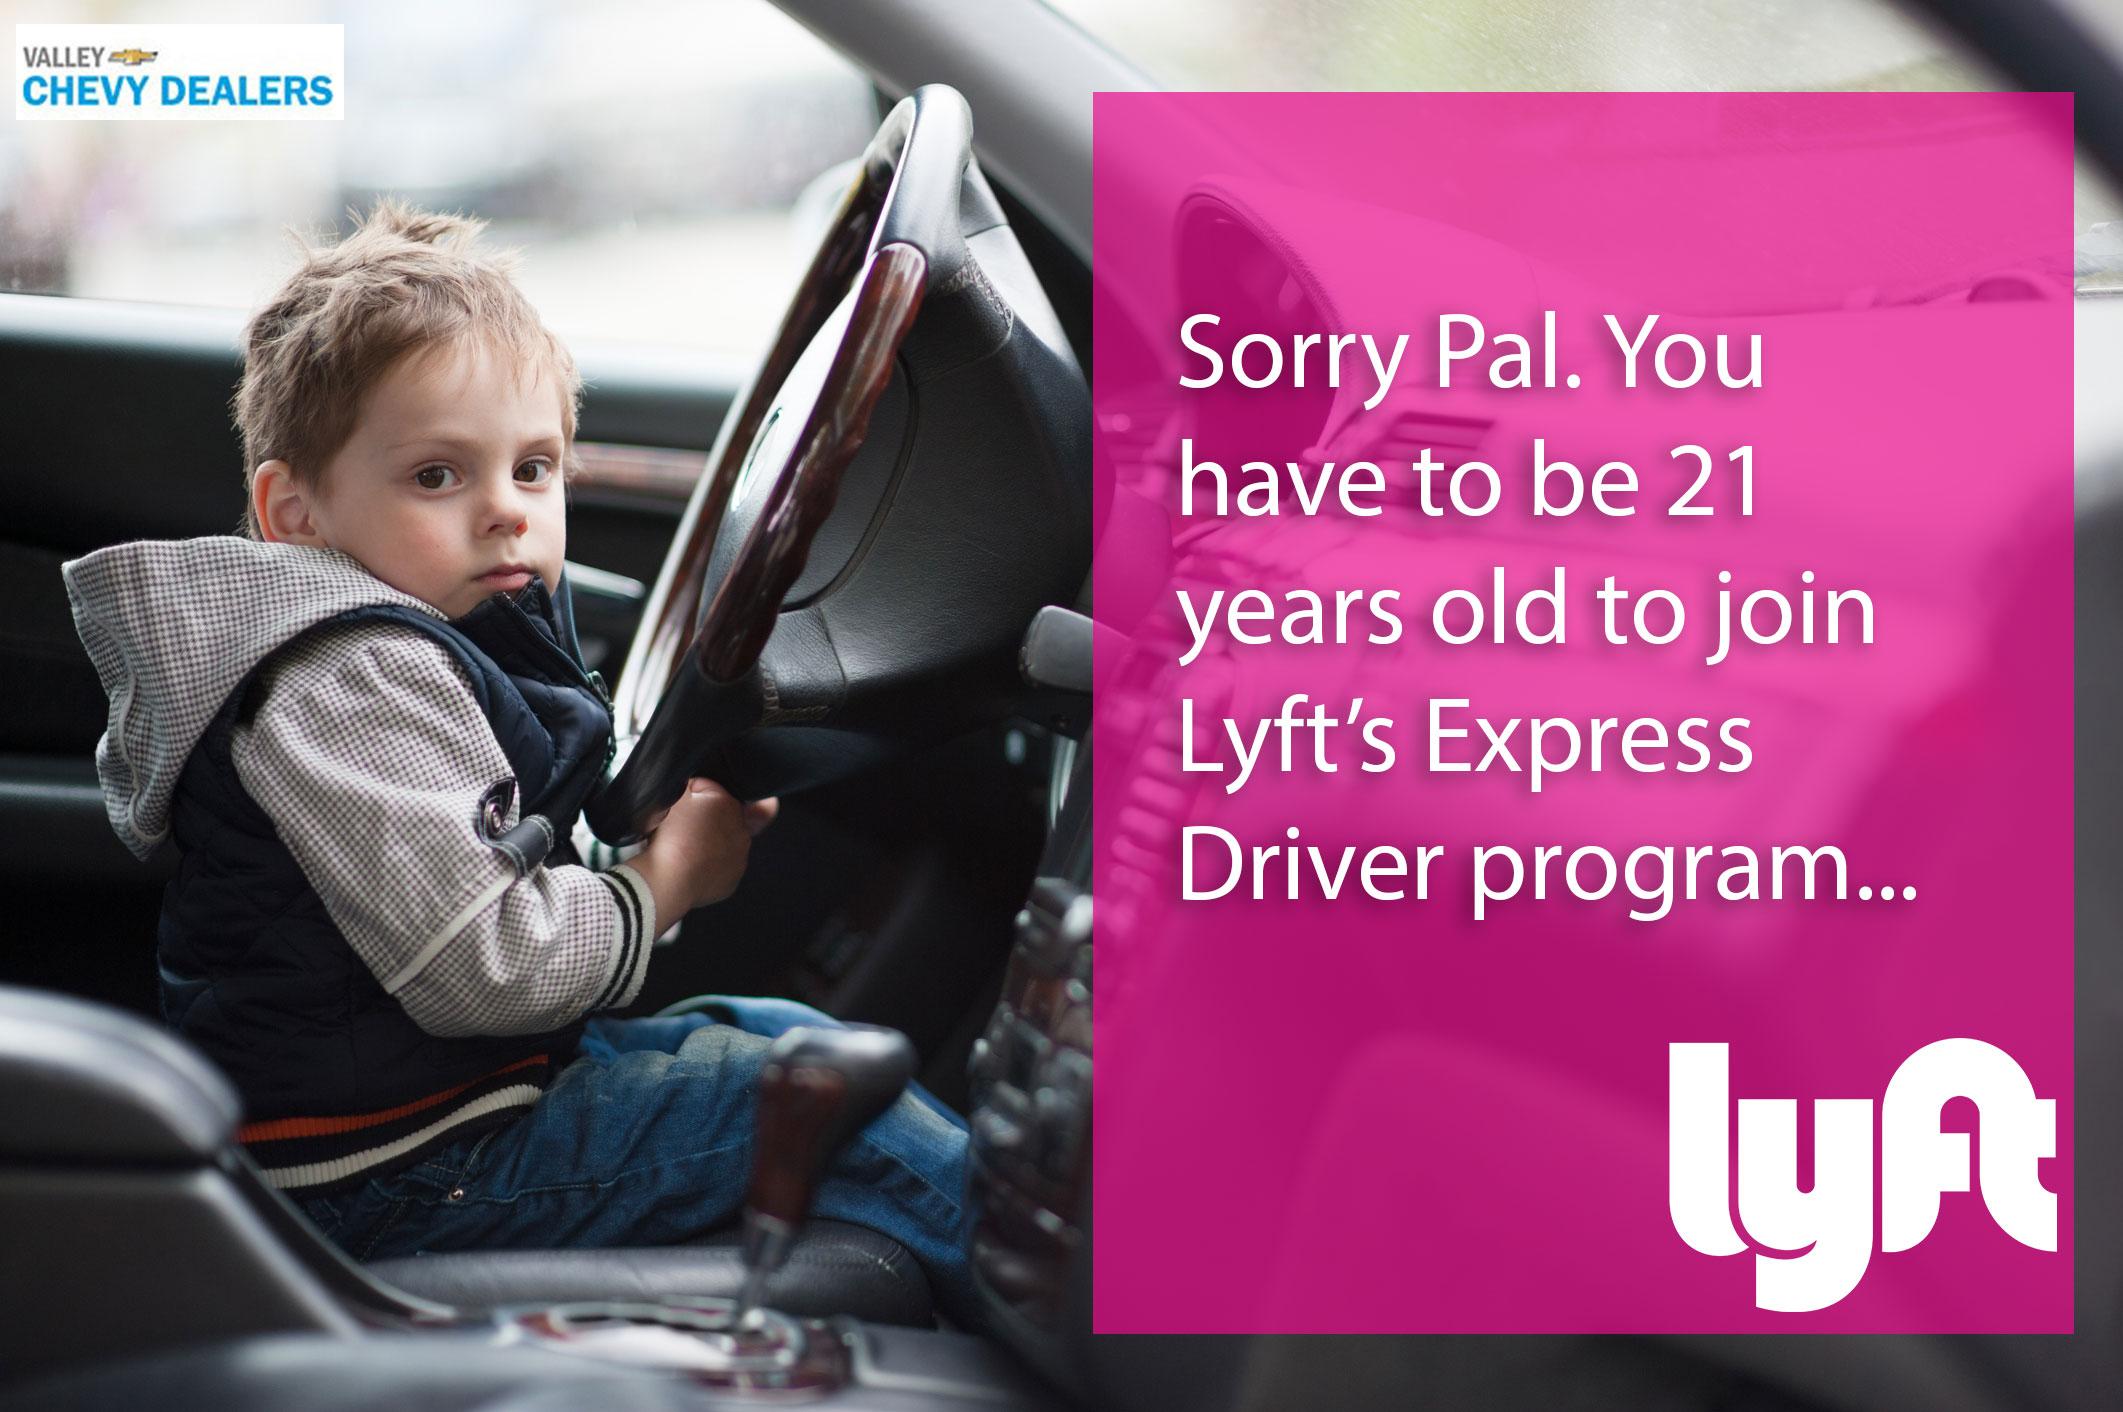 Valley Chevrolet - Lyft Express Driver Program: Apply